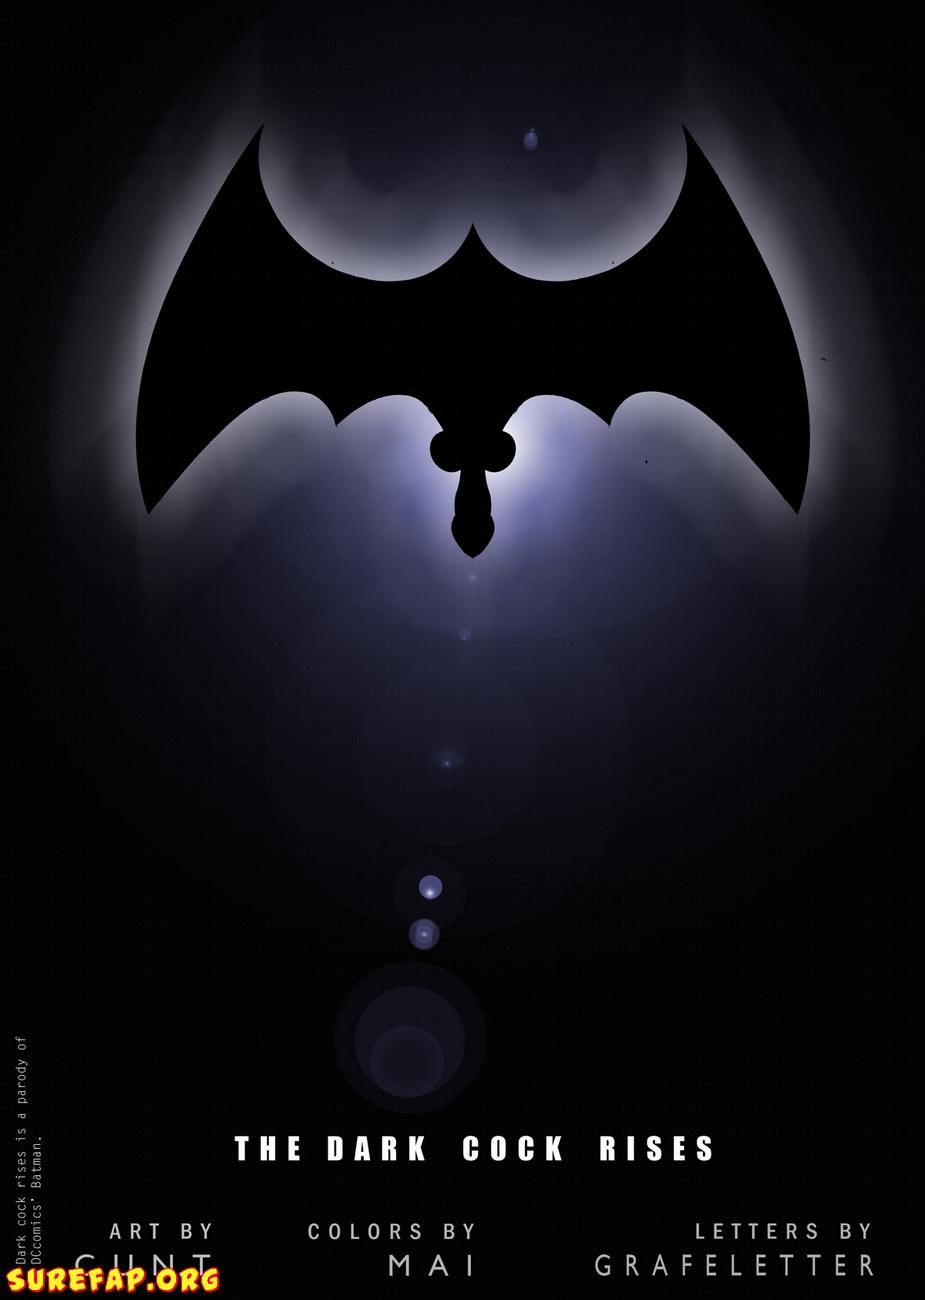 surefap.org__The-Dark-Cock-Rises-00_Gotofap_2632263000_1909325506.jpg